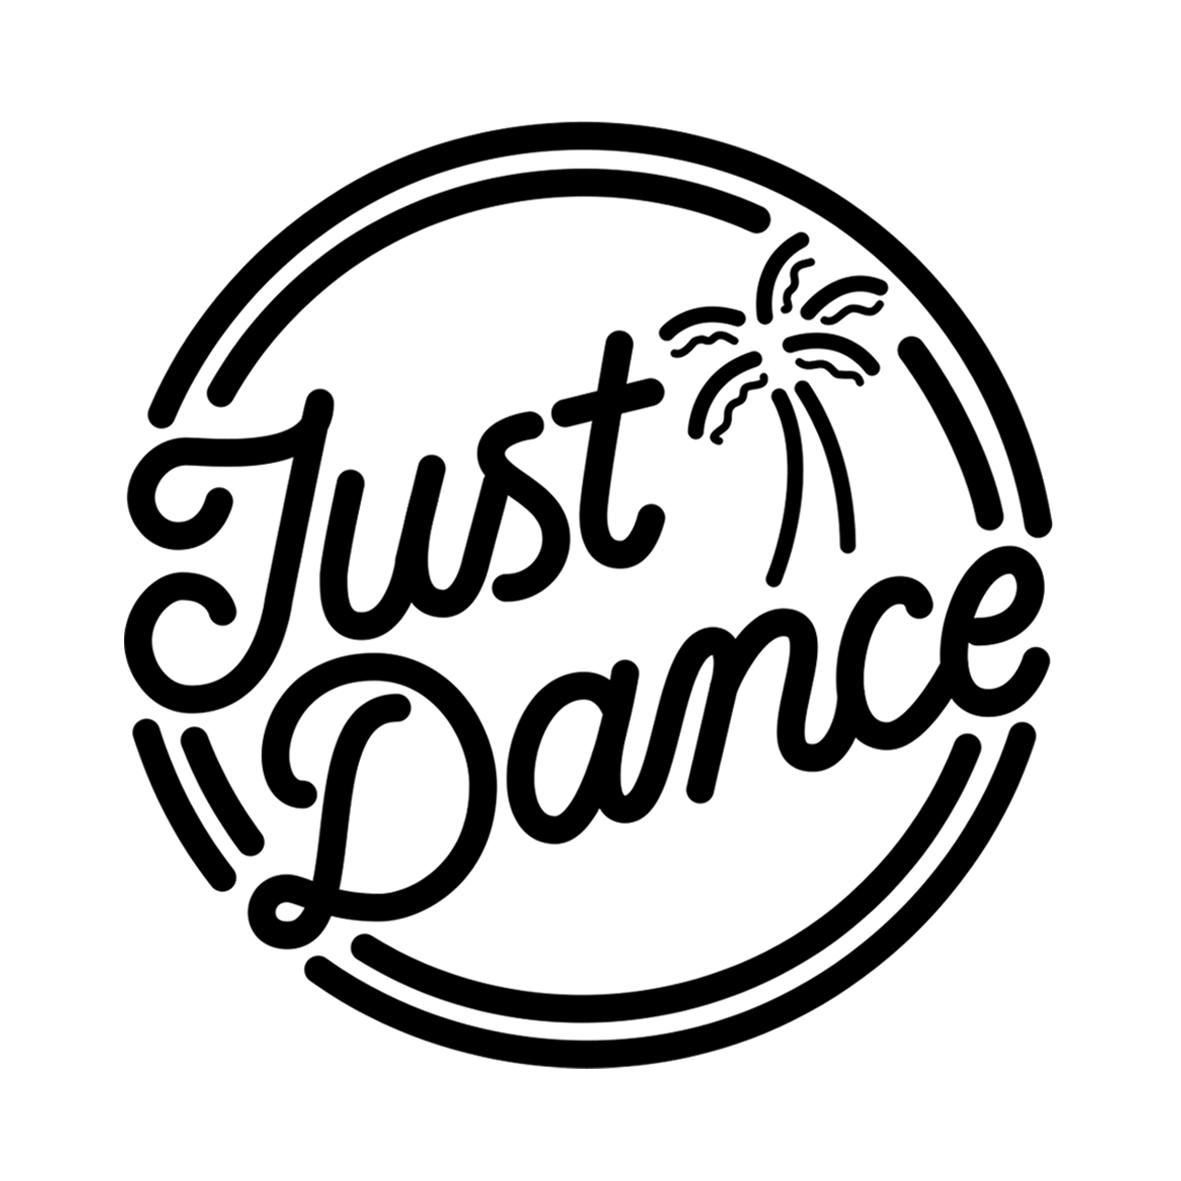 Week1_JustDance_B&W.png